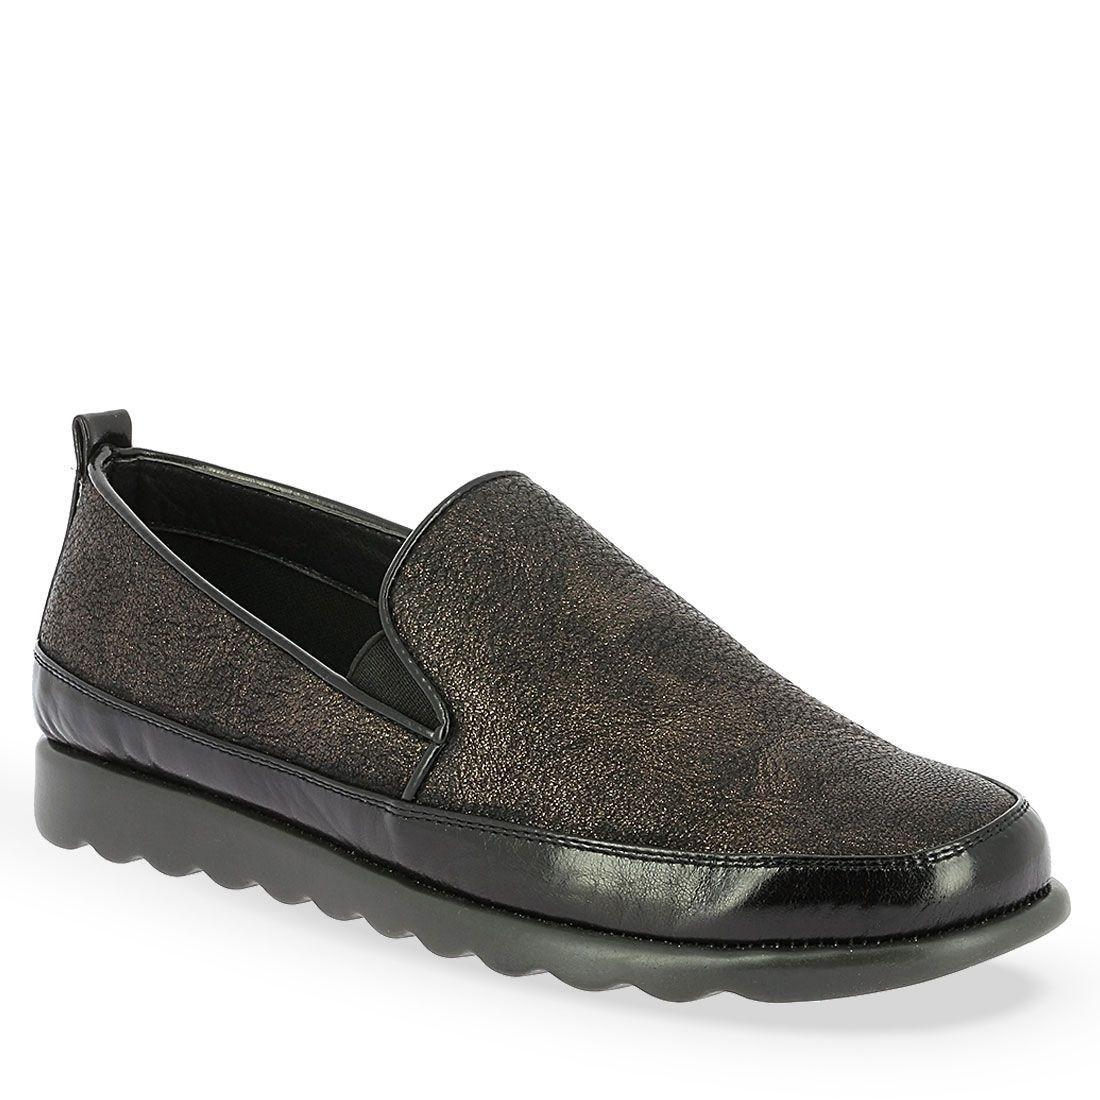 804ea00c6e PAREX Γυναικεία Παπούτσια Ανατομικά 12918004 Μπρονζέ